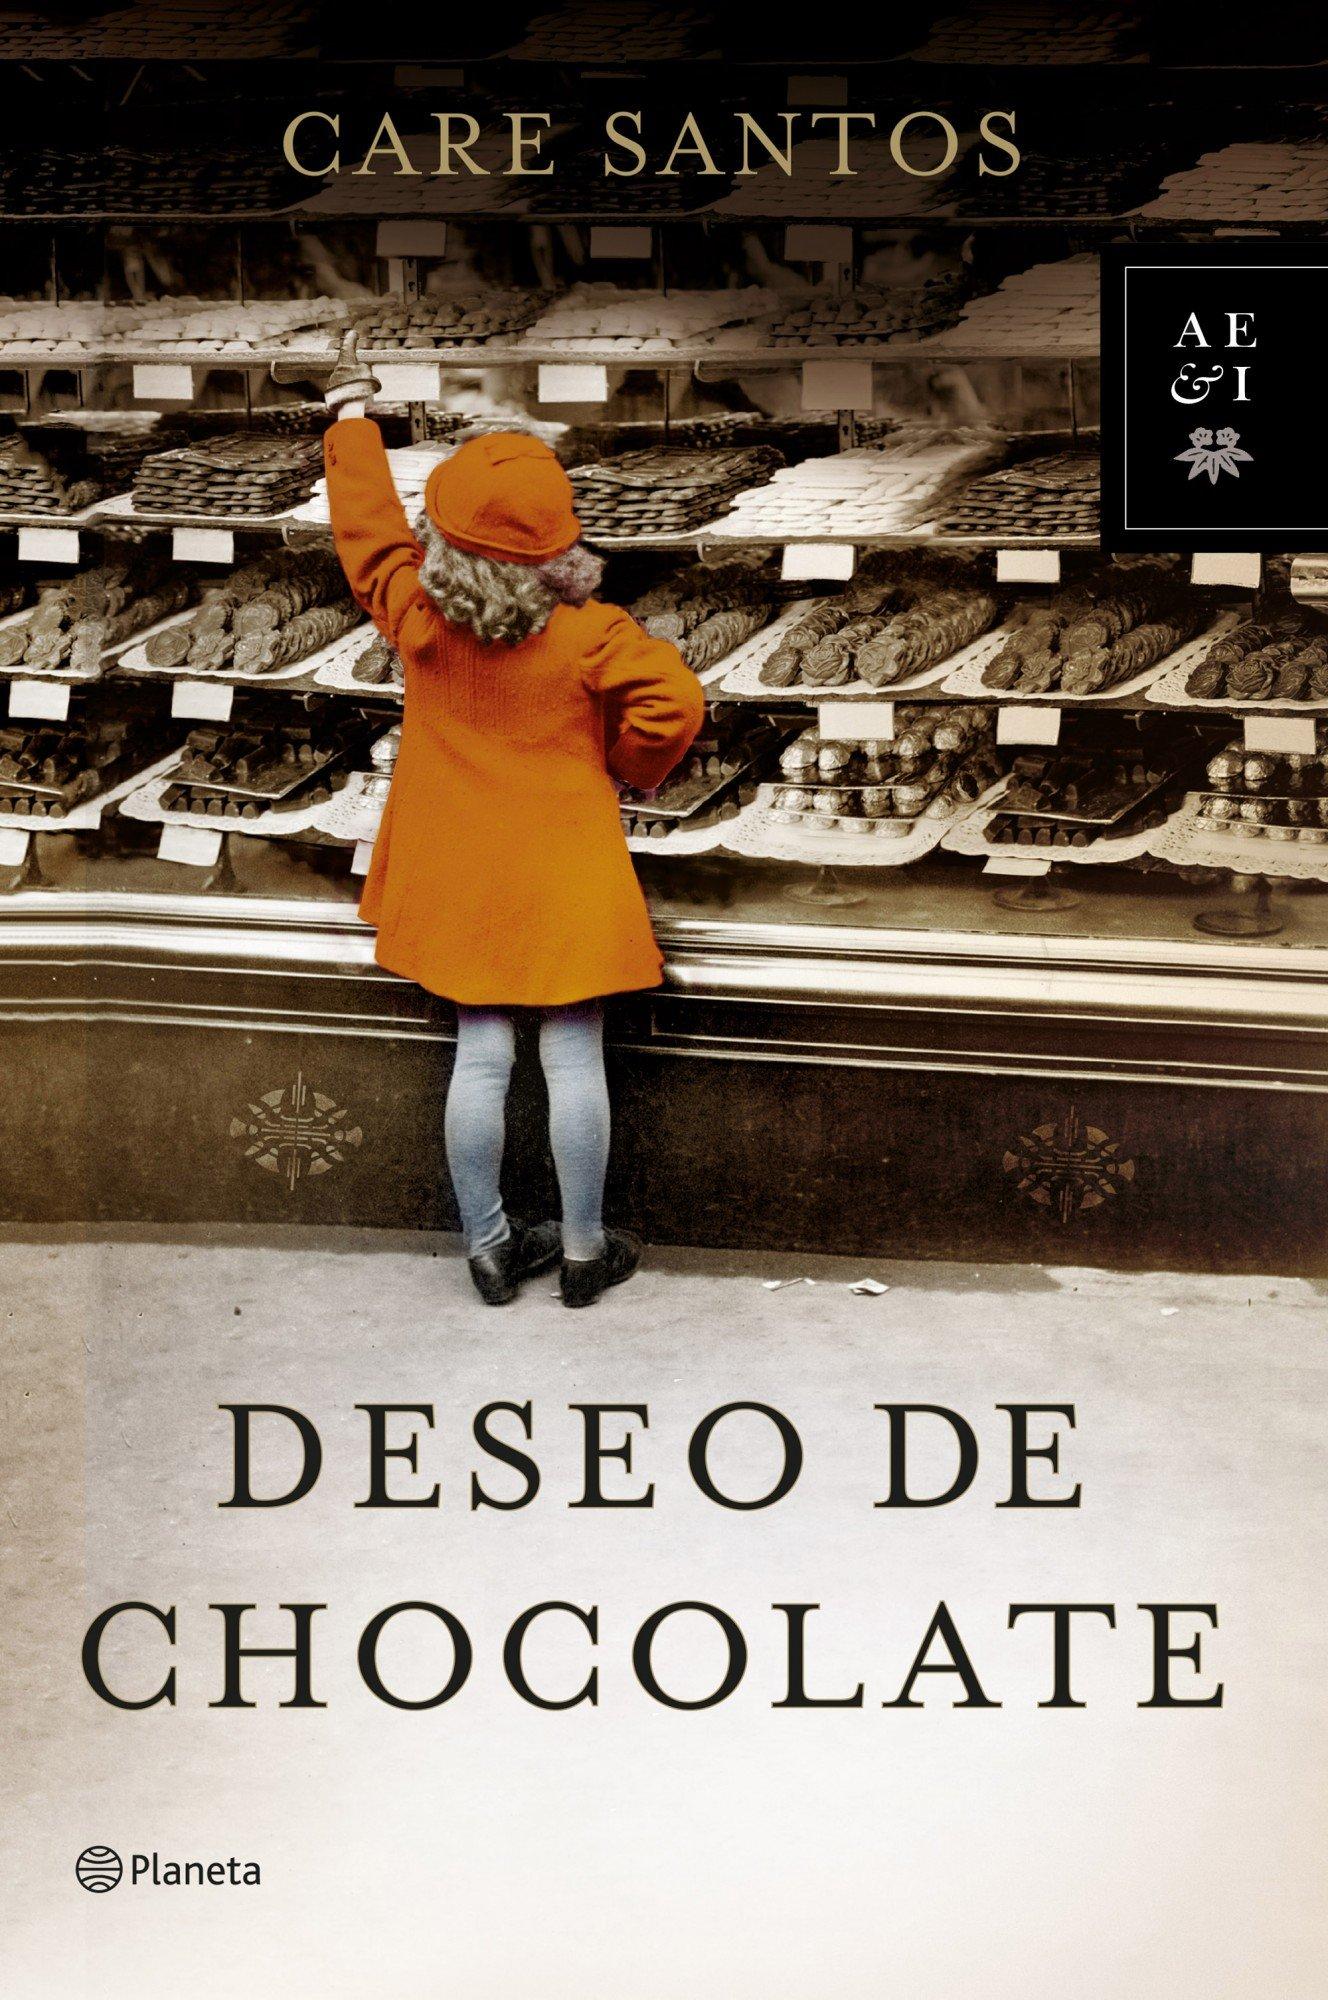 Deseo de chocolate Autores Españoles e Iberoamericanos: Amazon.es: Care Santos: Libros